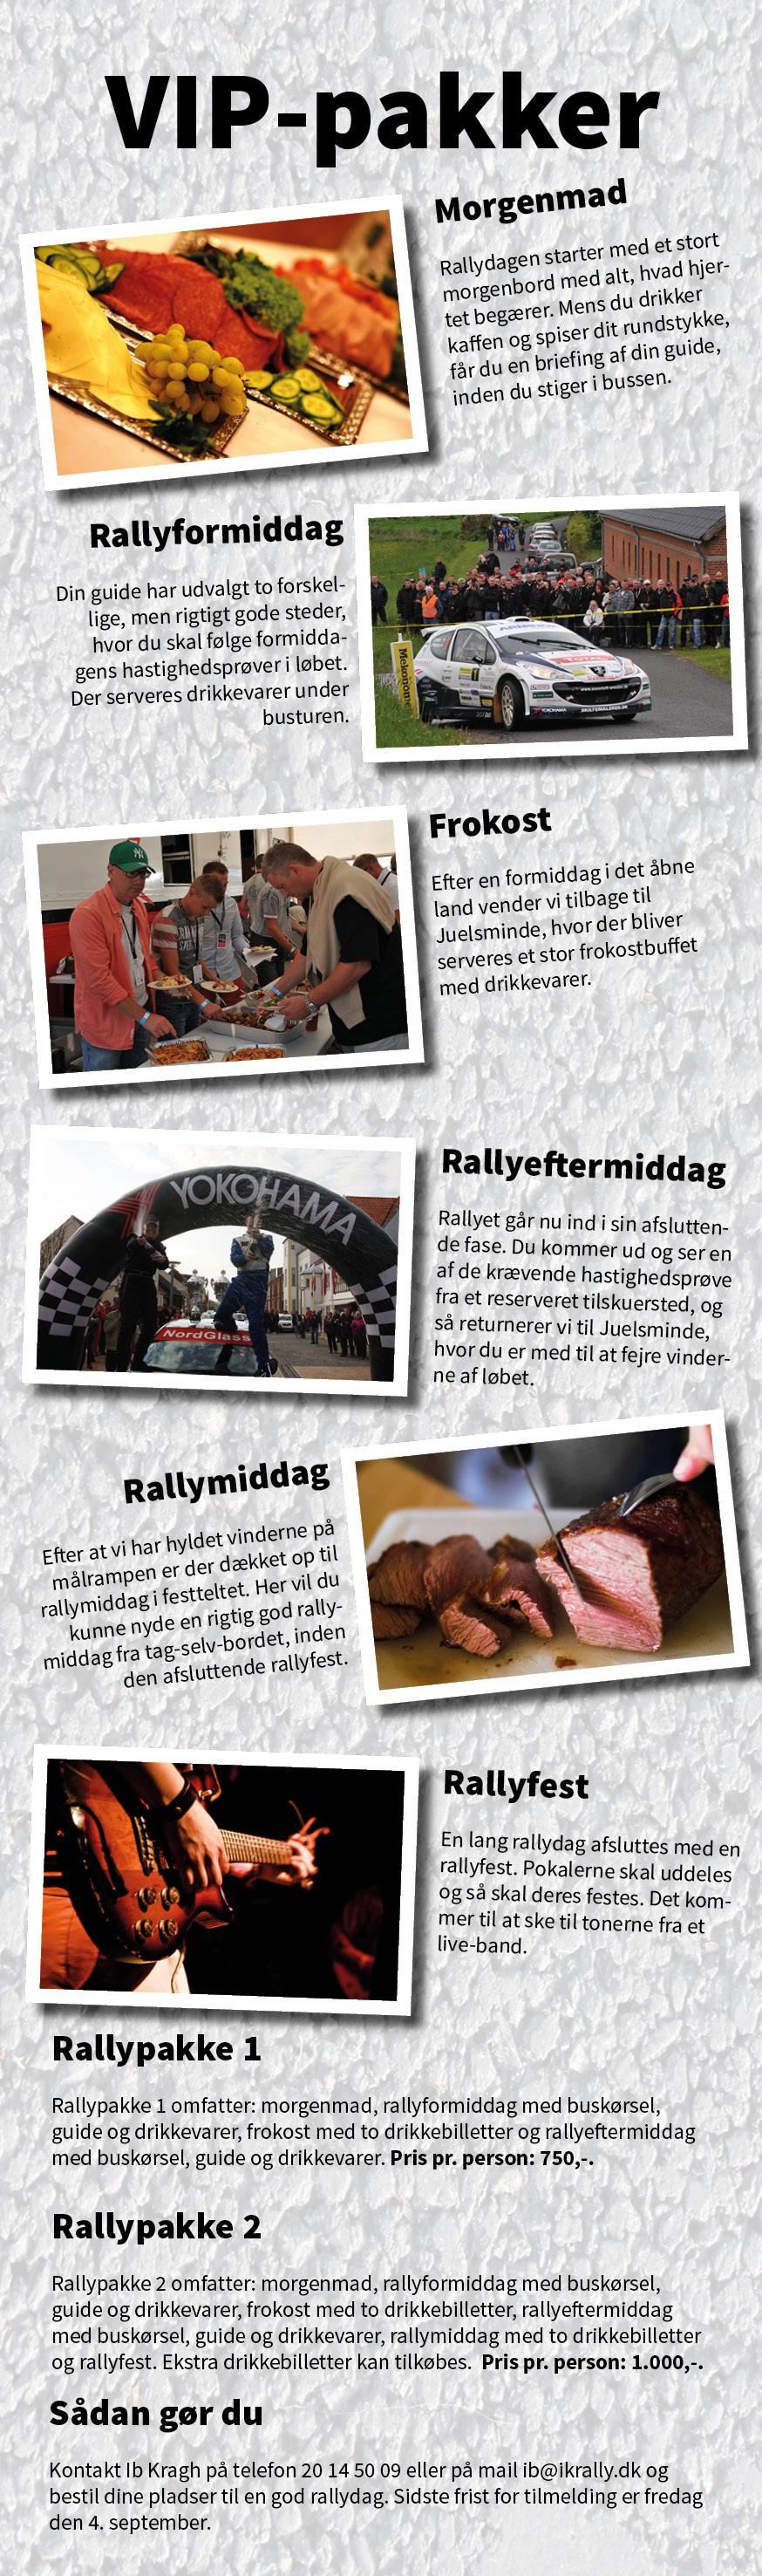 2015-Rally-Juelsminde-Rally-VIP-pakker-02